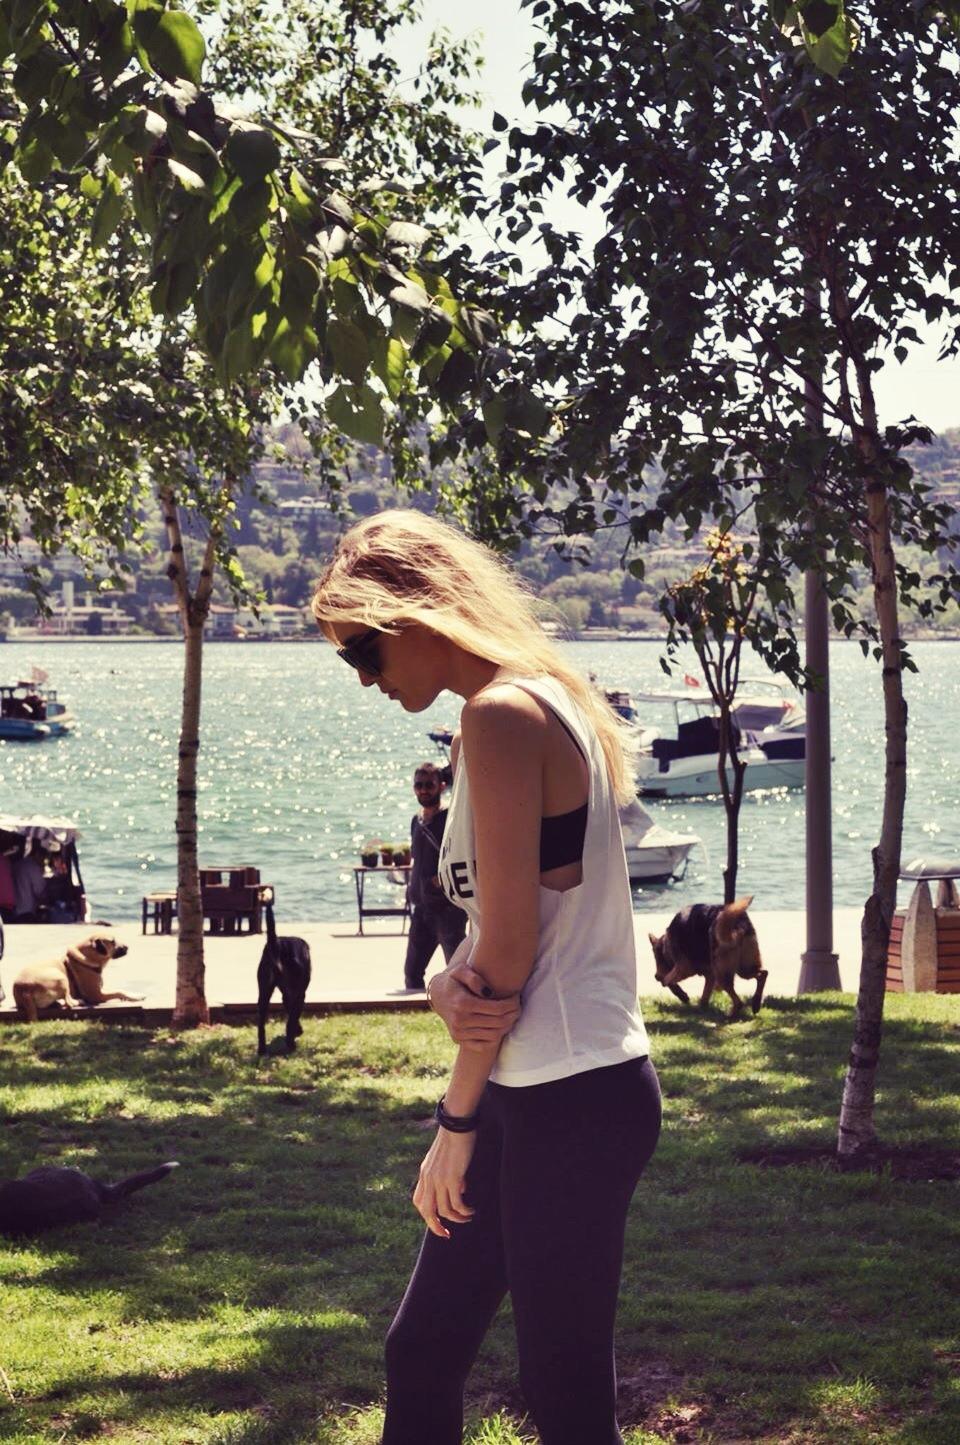 ntctoristanbul-ntc-tour-istanbul-nike-training-club-suada-galatasaray-adası-kendimigectim-burcu-ozcan-6